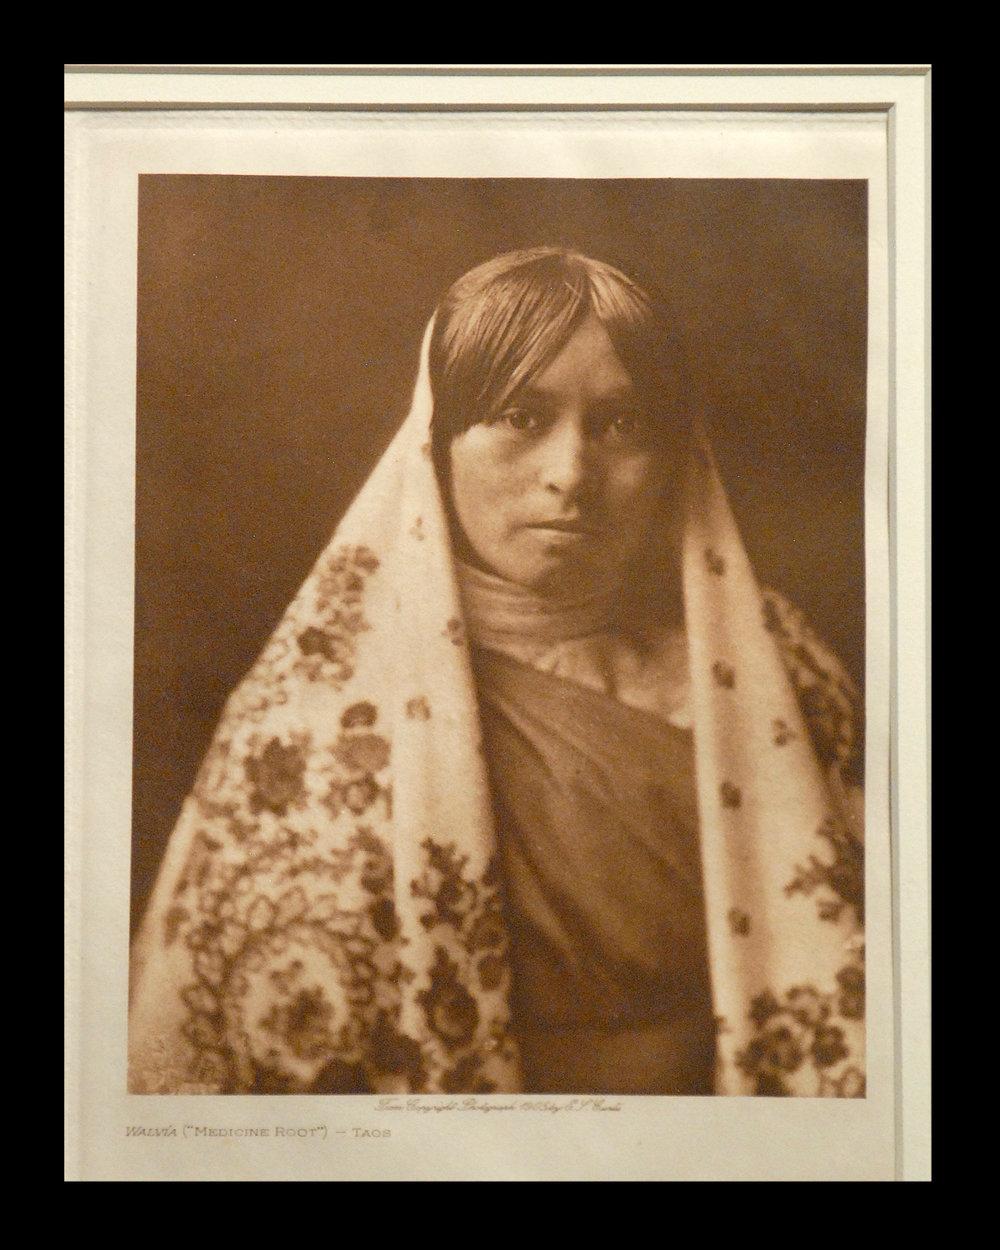 """Walvia (""Medicine Root"") - Taos 1905 Vol.17 Vellum Print,Vintage Photogravure"